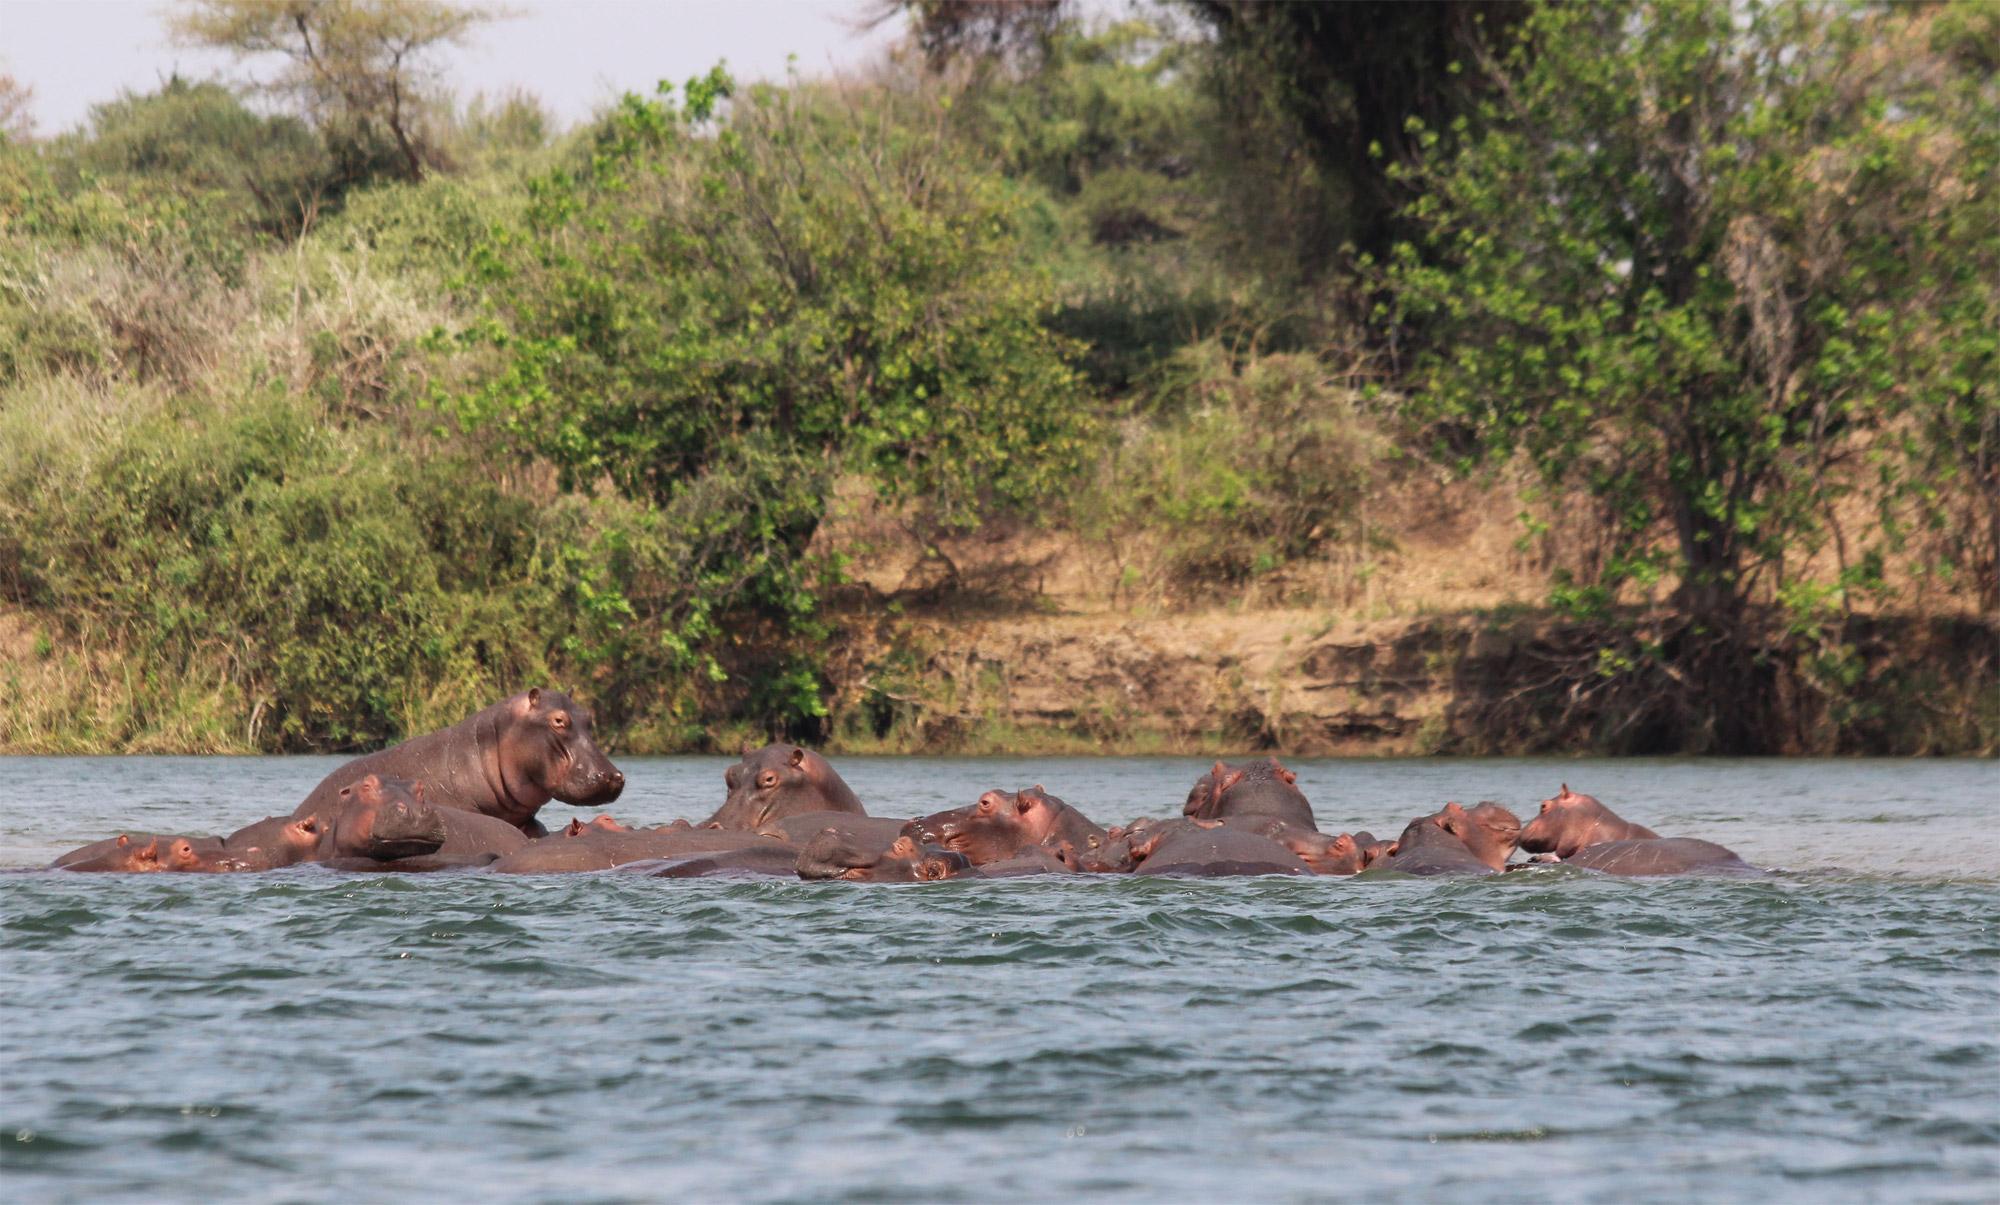 Slalommen om nijlpaarden - een avontuur op de machtige Zambezi rivier - Nijlpaarden in de Zambezi rivier